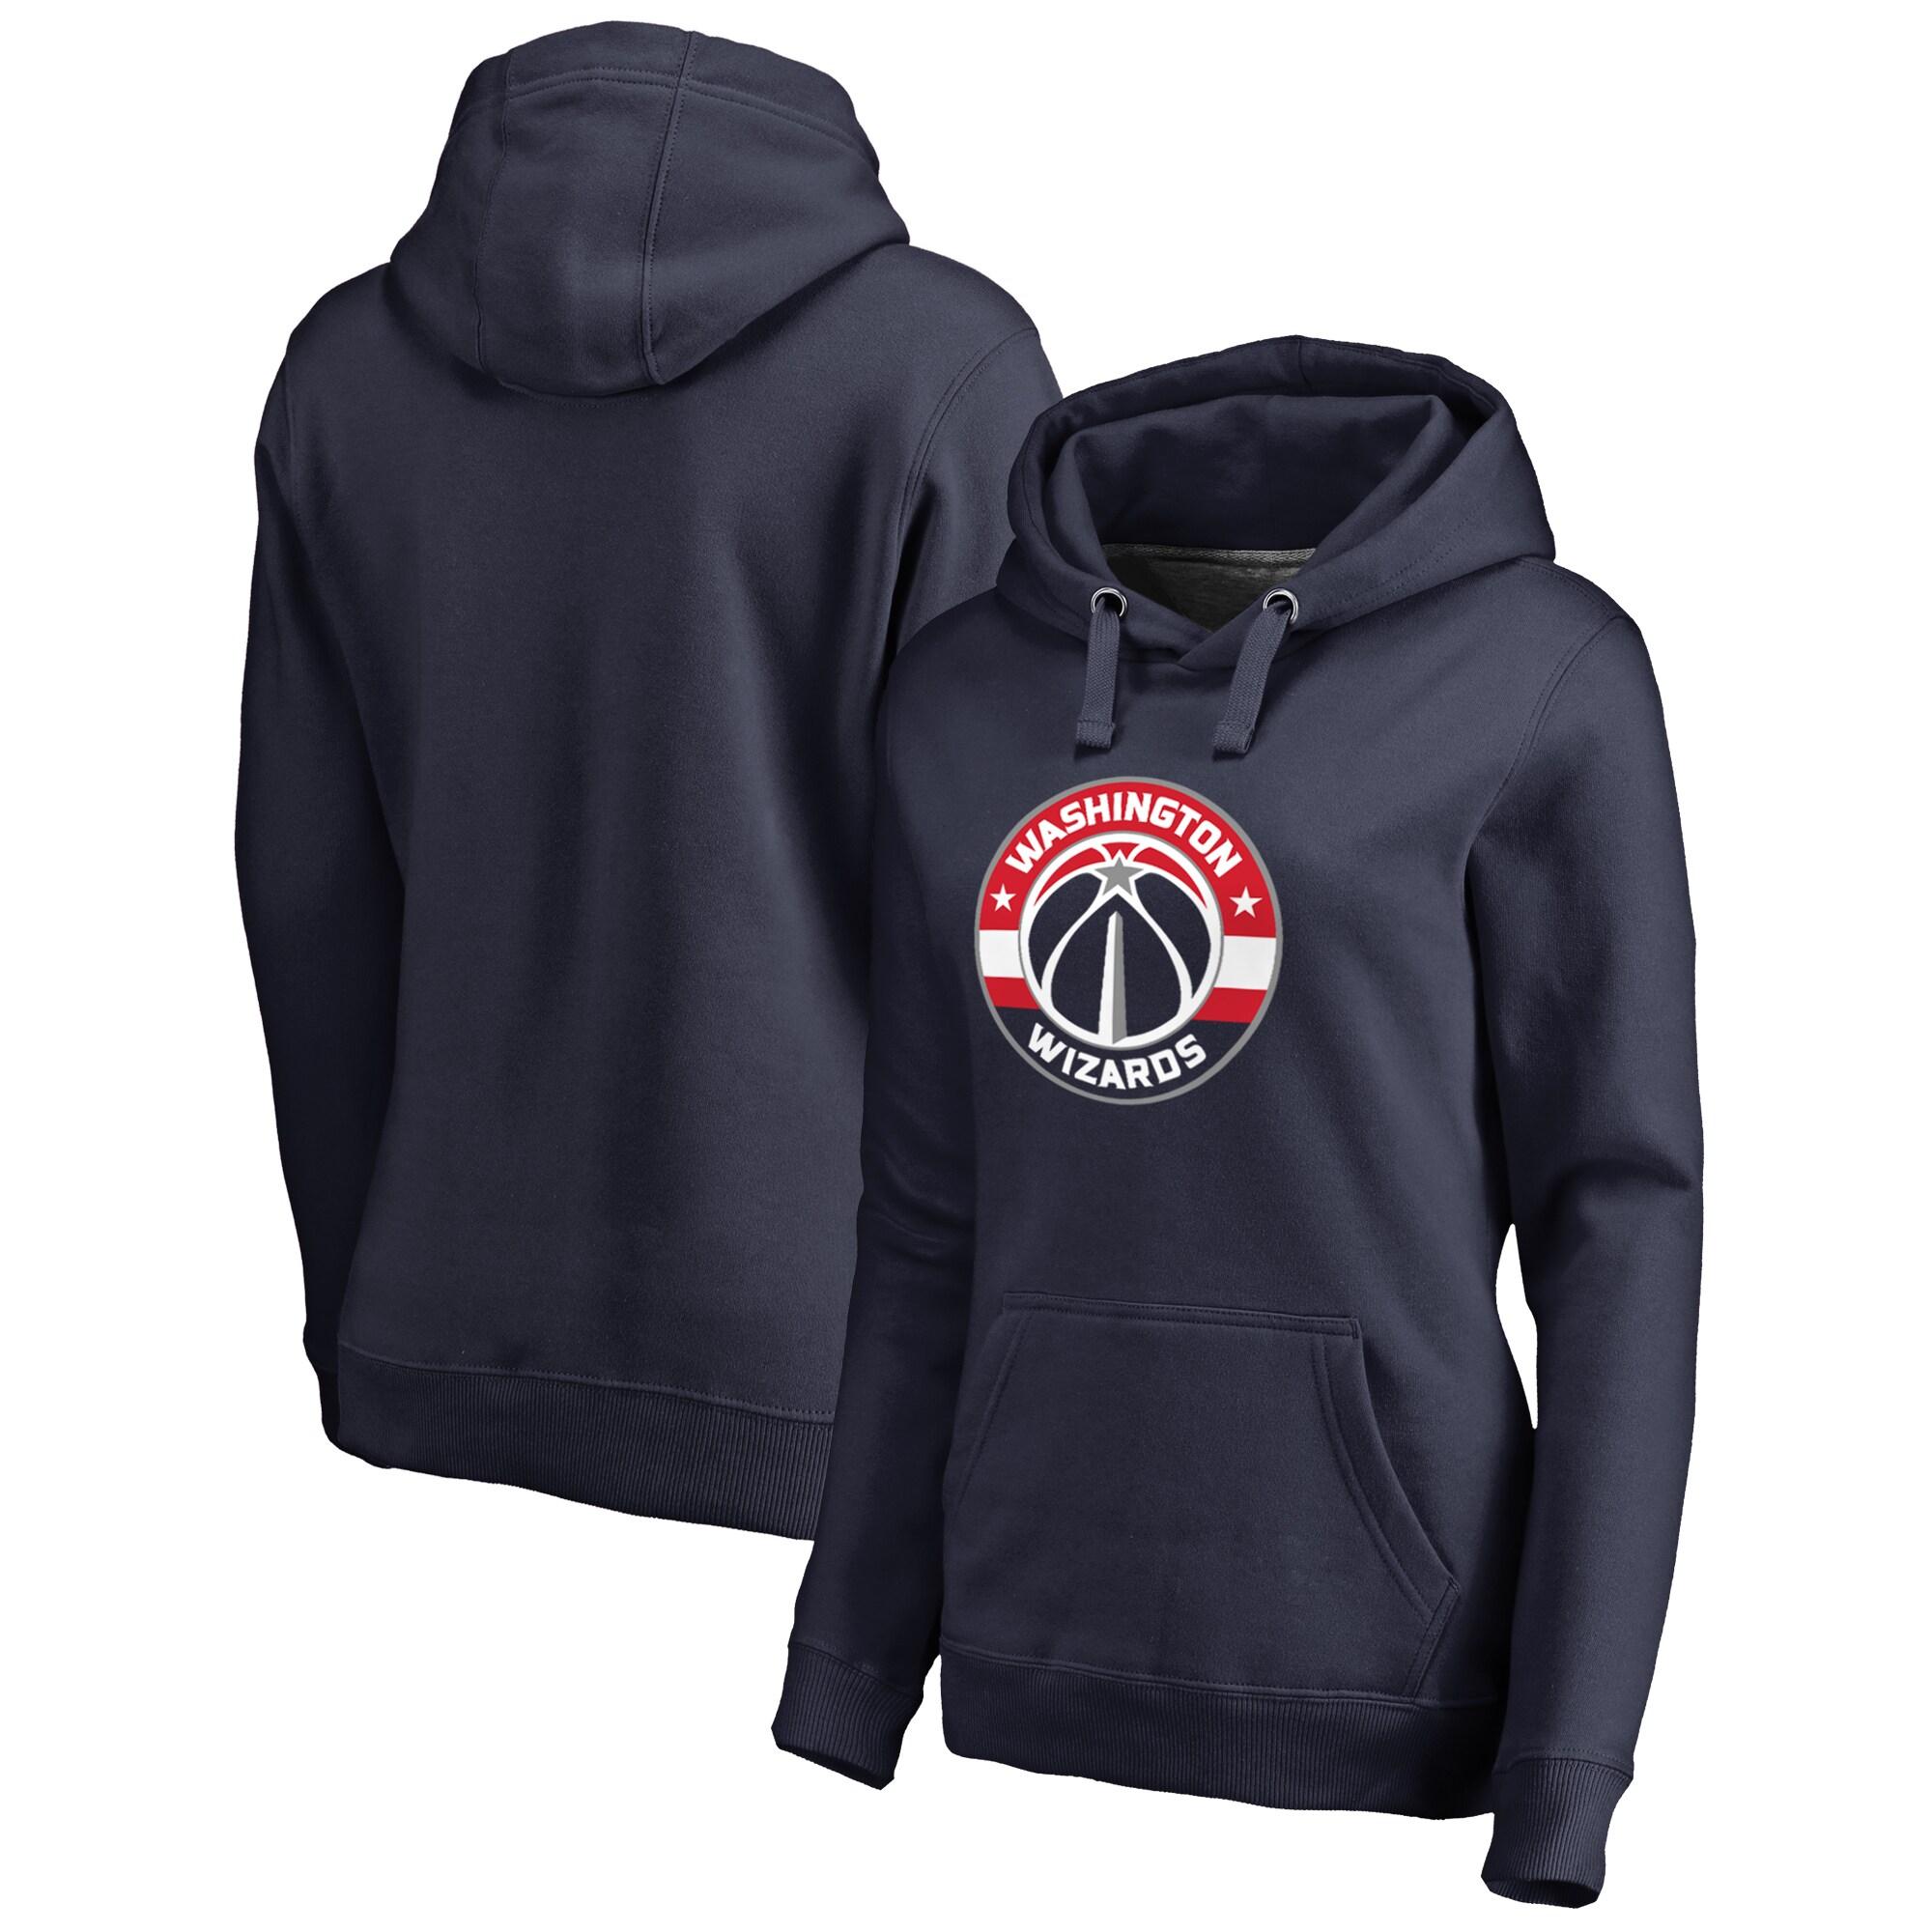 Washington Wizards Fanatics Branded Women's Plus Size Primary Logo Pullover Hoodie - Navy